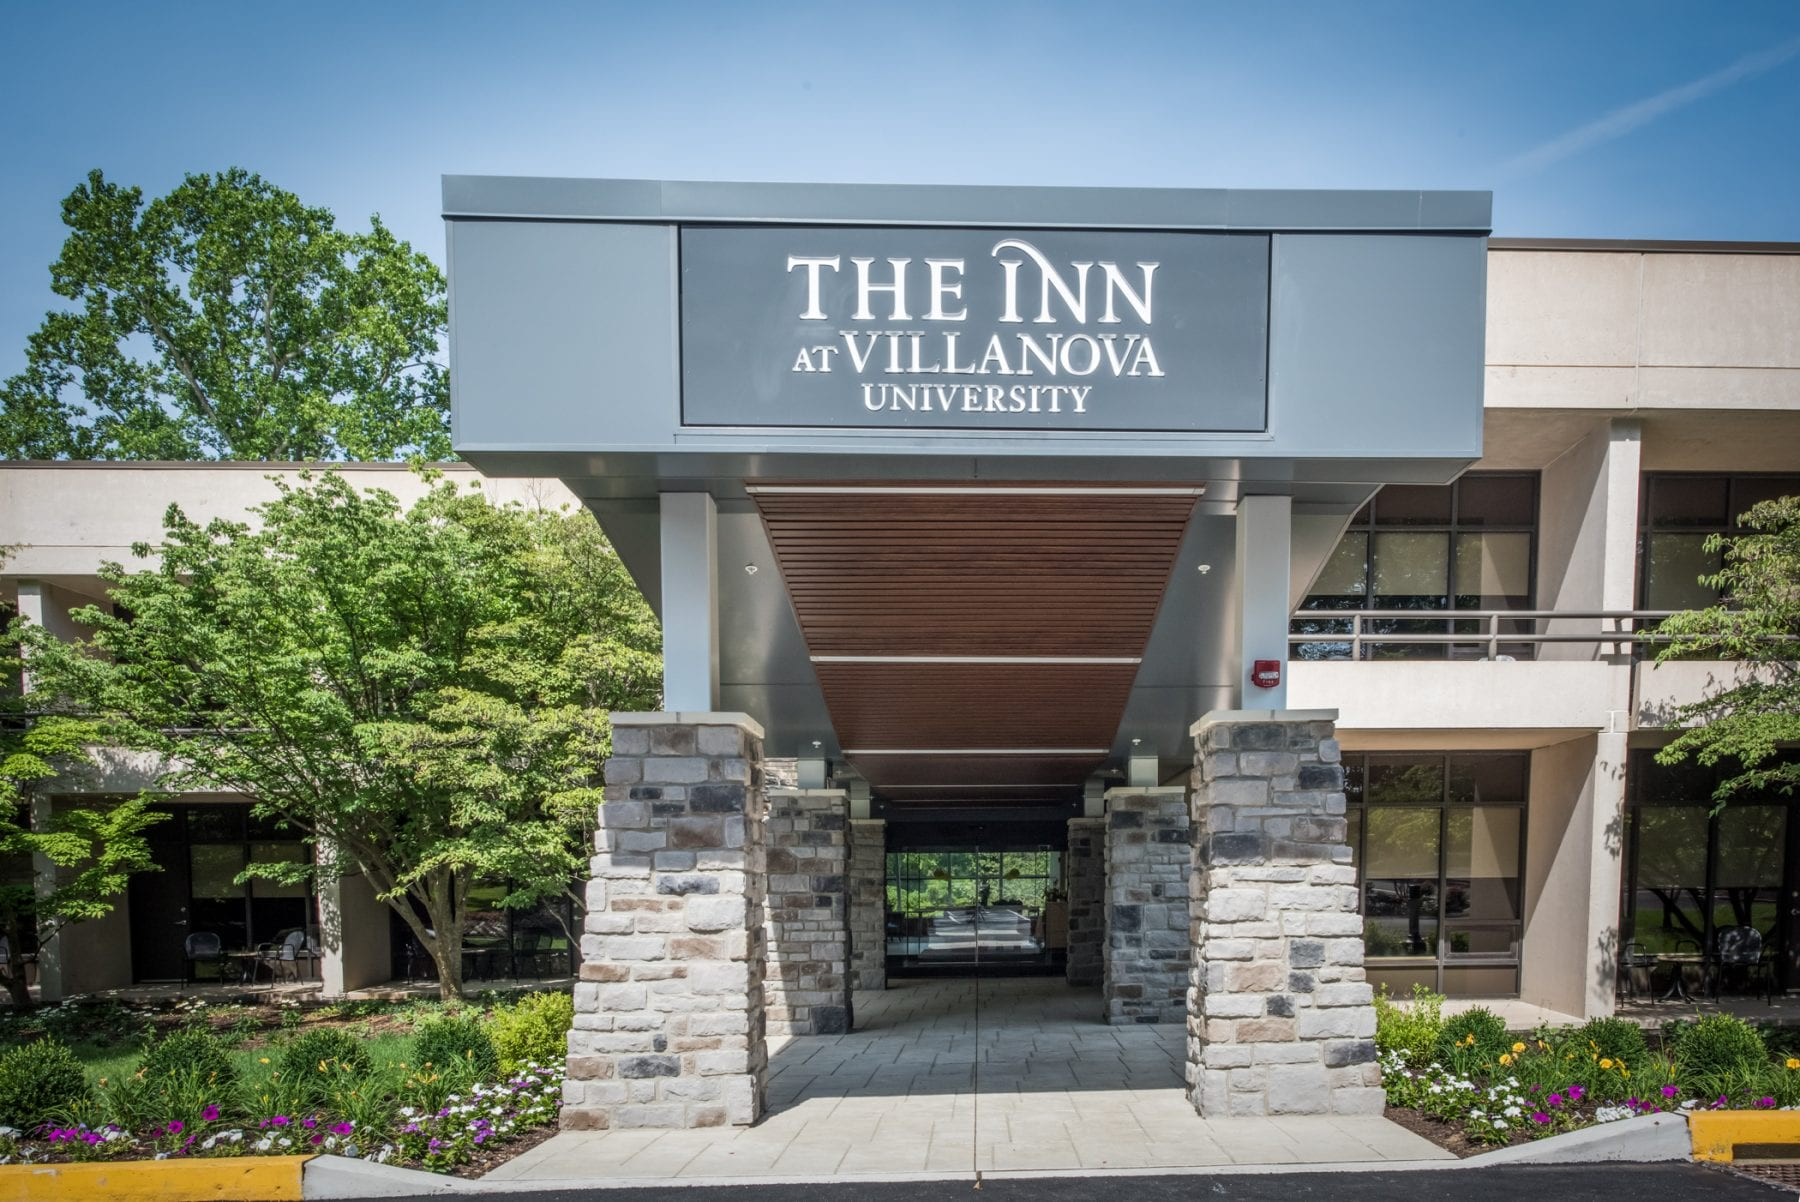 The Inn at Villanova University